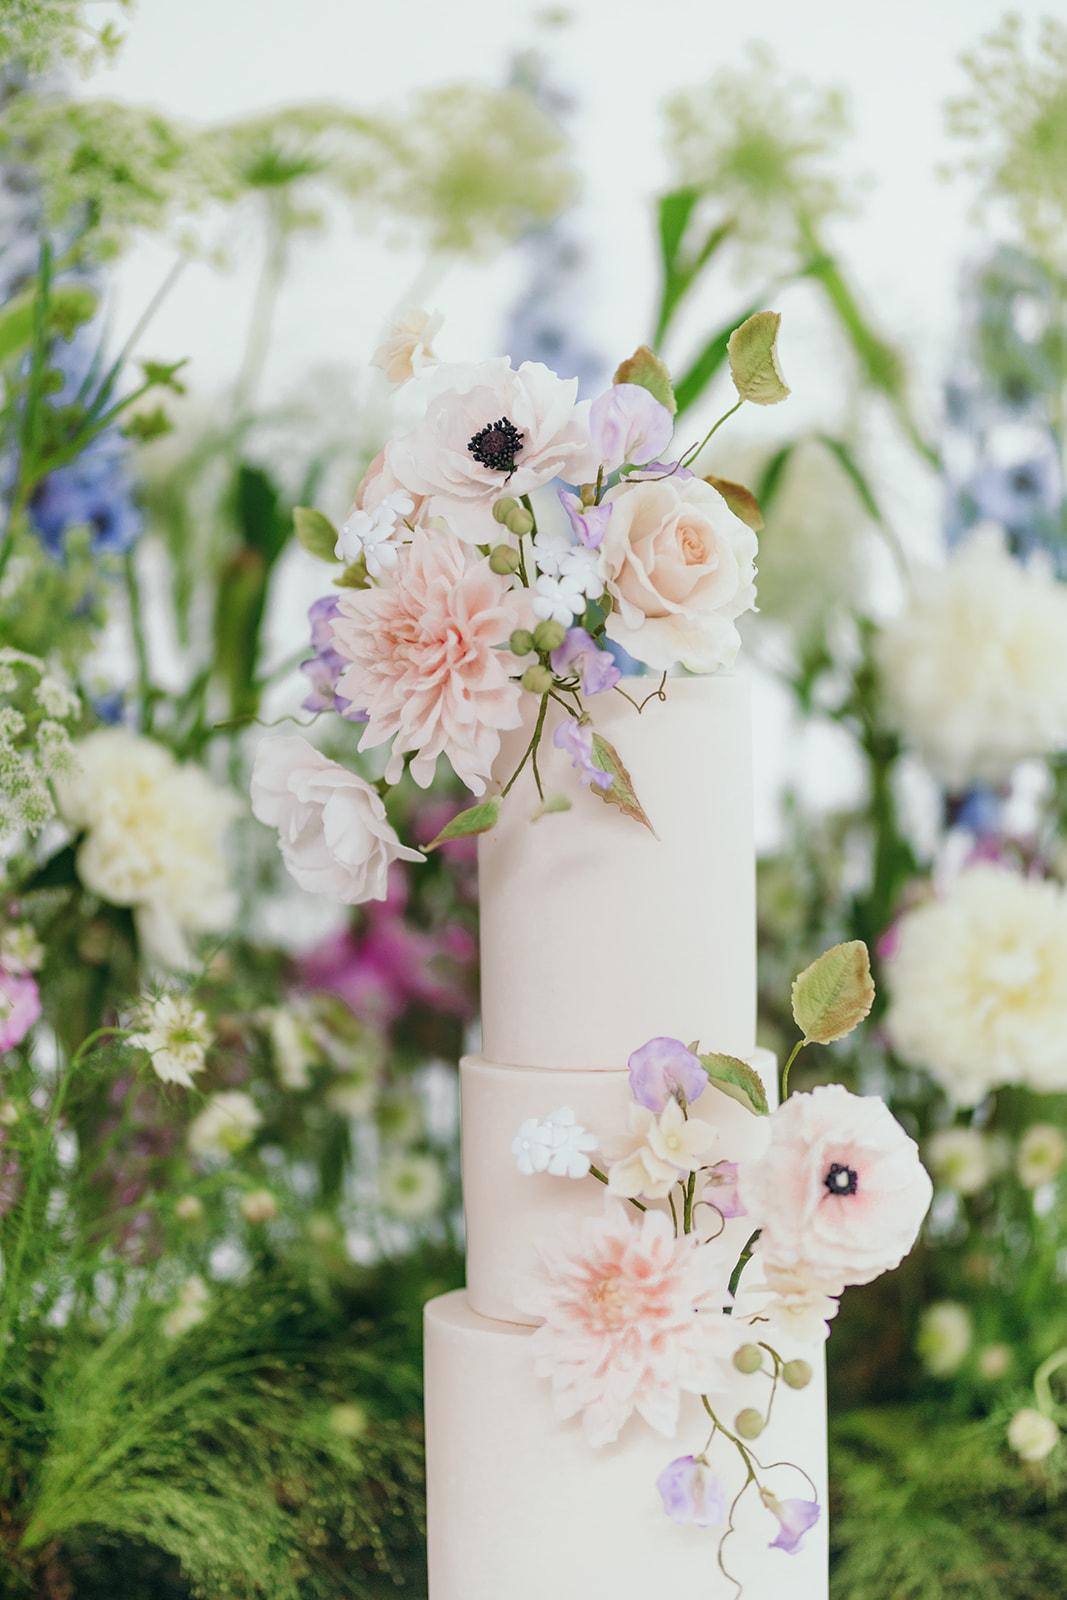 Summer Flower Wedding Cake